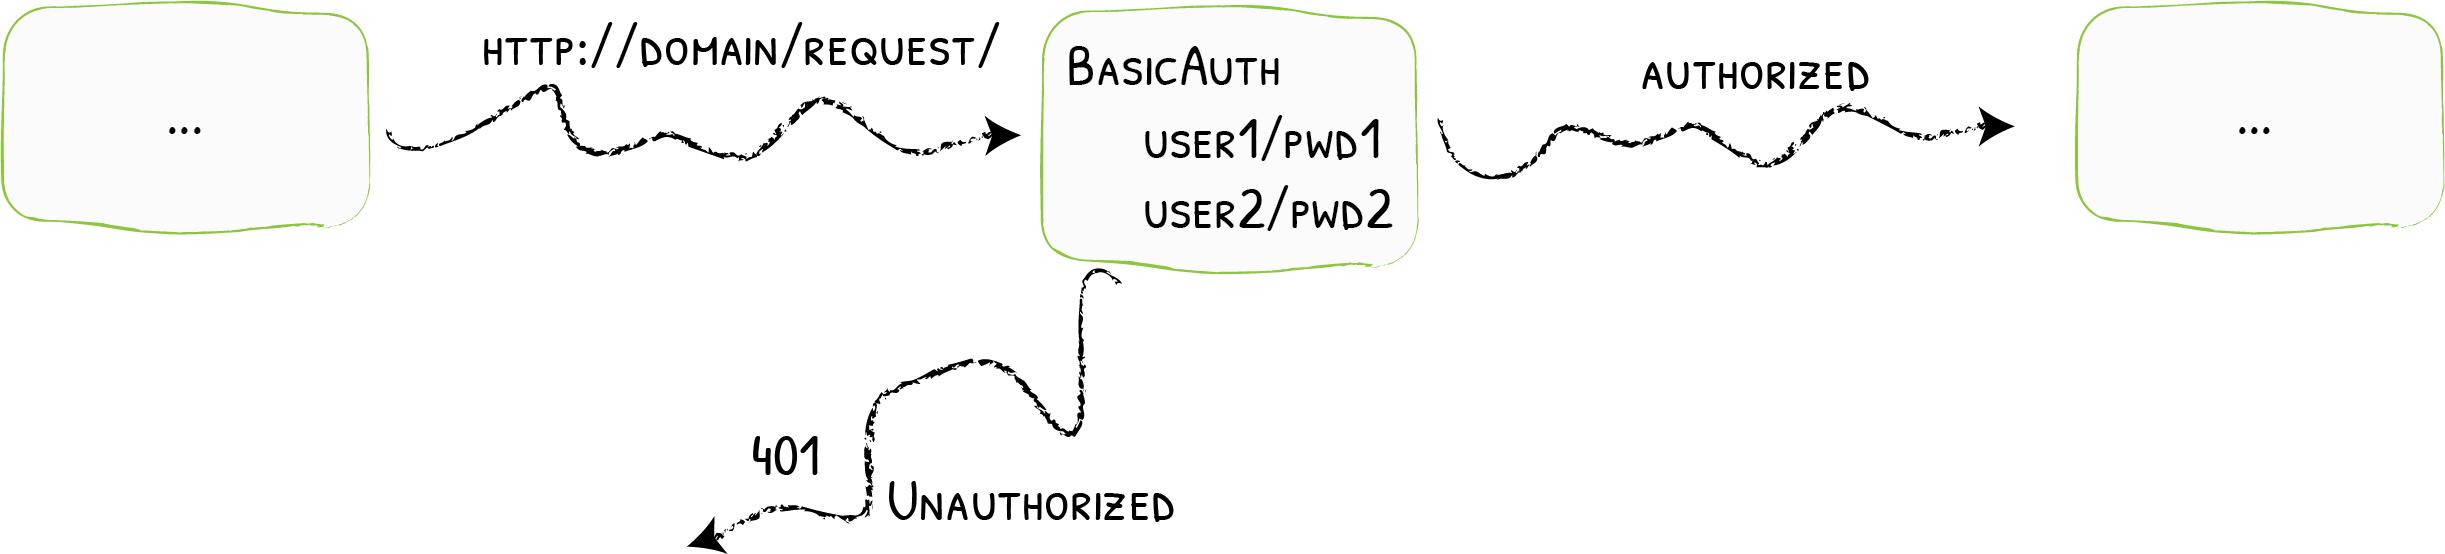 BasicAuth - Traefik